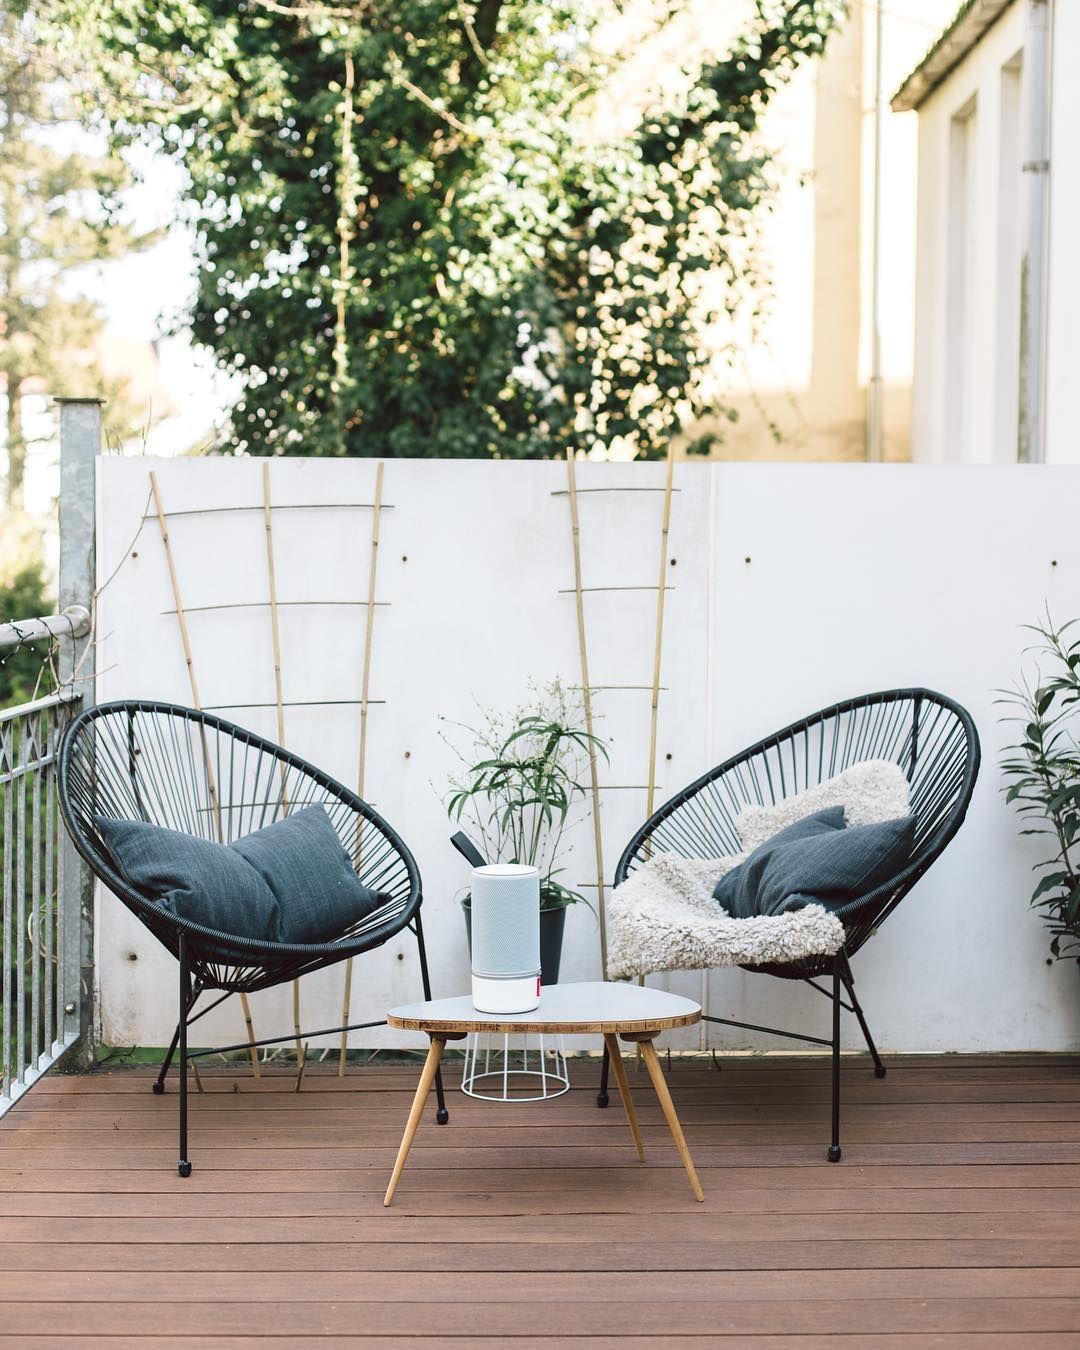 Acapulco Chair Acapulco Garden Chair Outdoor Chairs Design